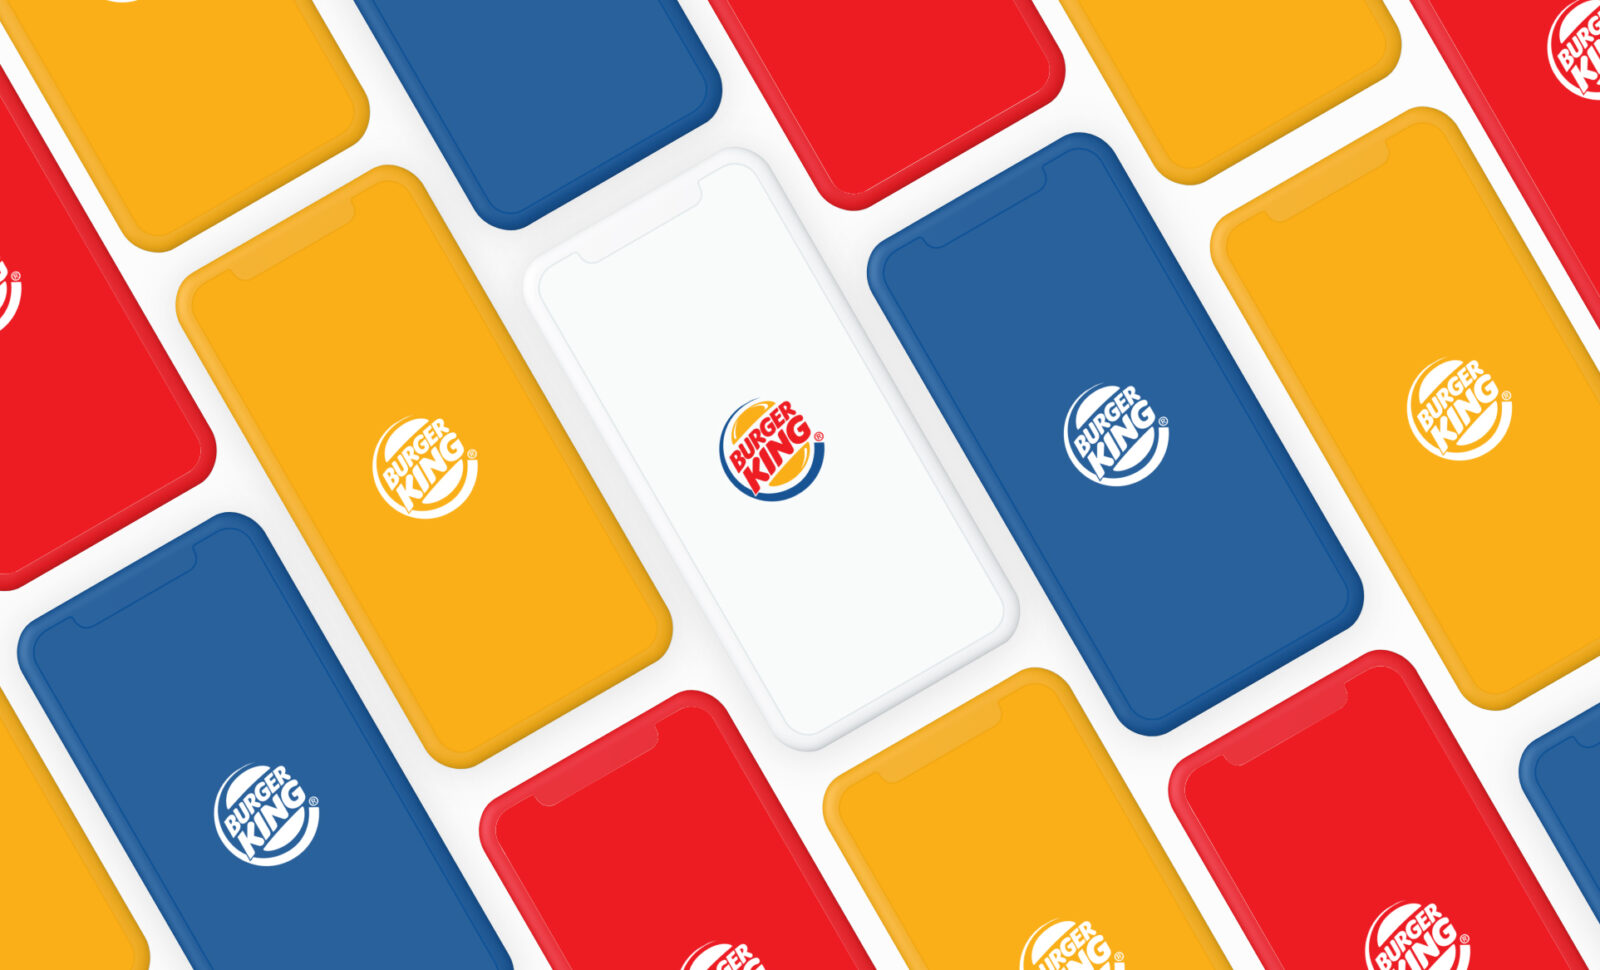 BurgerKing App